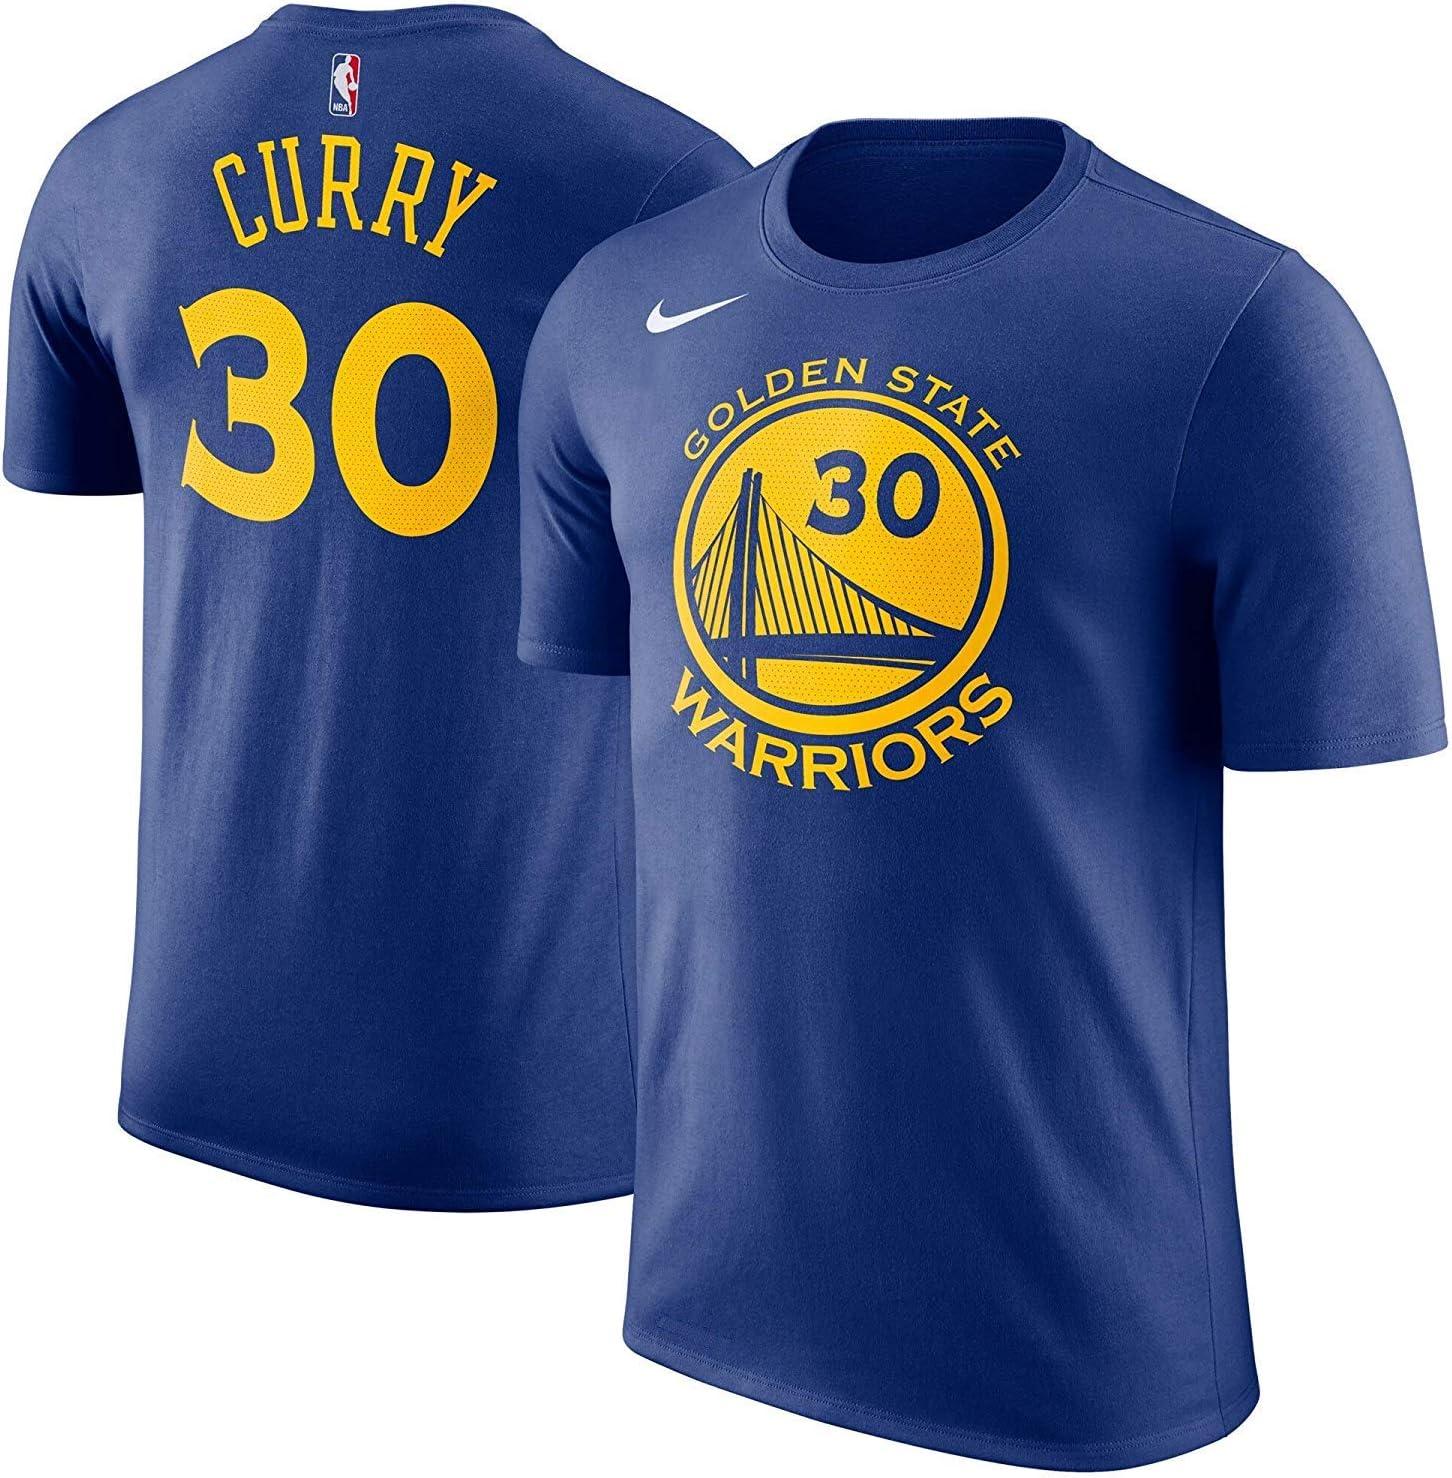 NBA Stephane curry T shirt (youth blue) Warriors adidas